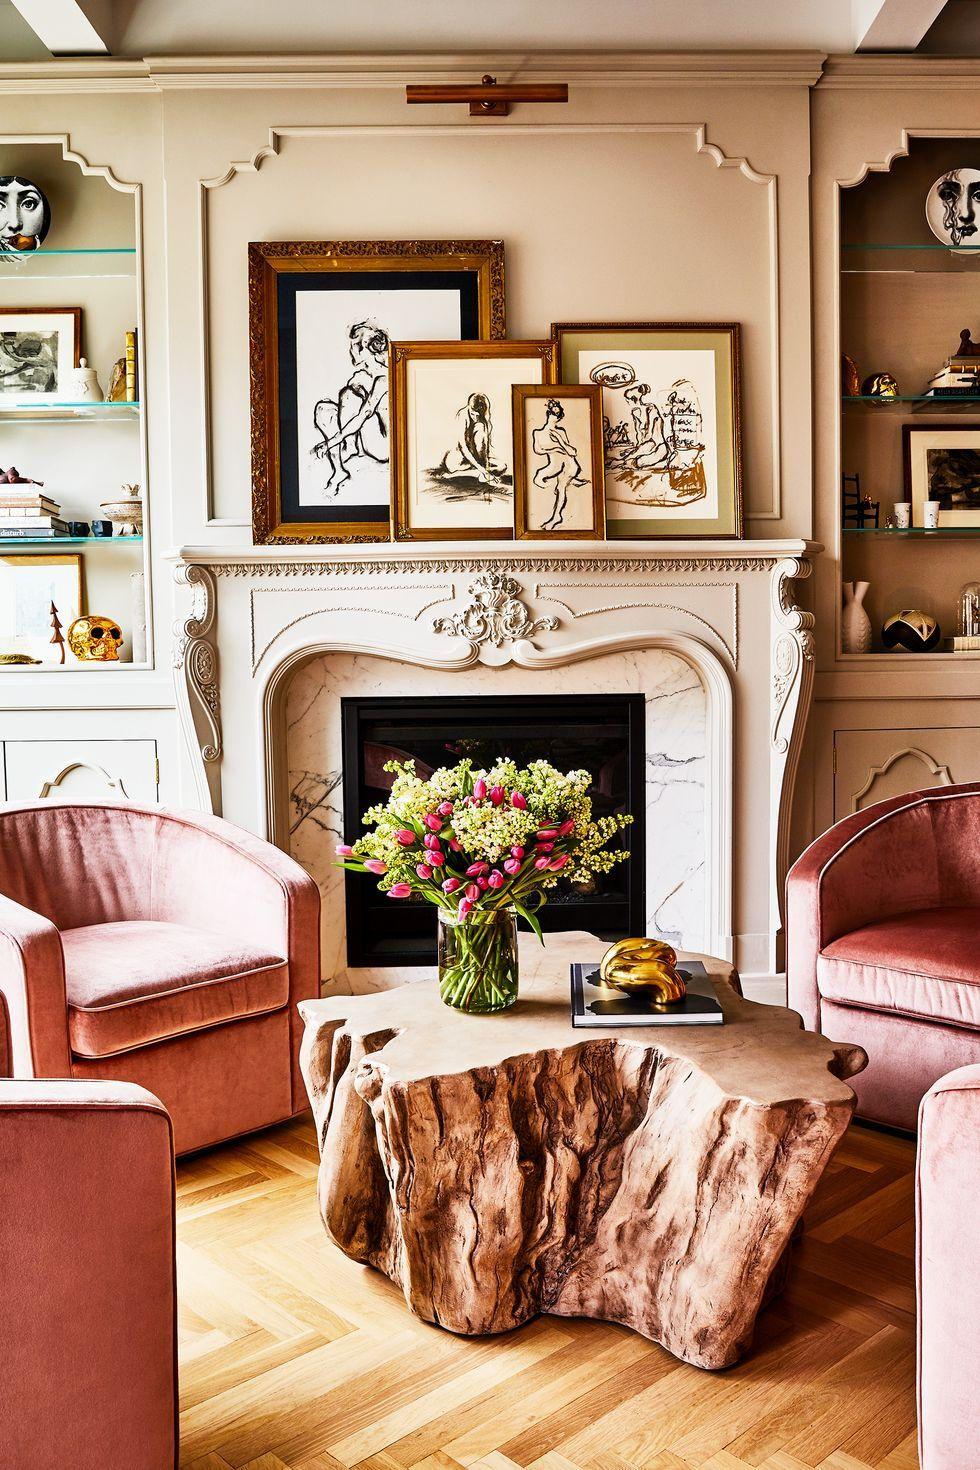 Transformative Wall Decor Ideas You Can Easily Recreate At Home Victoria House House Interior Home